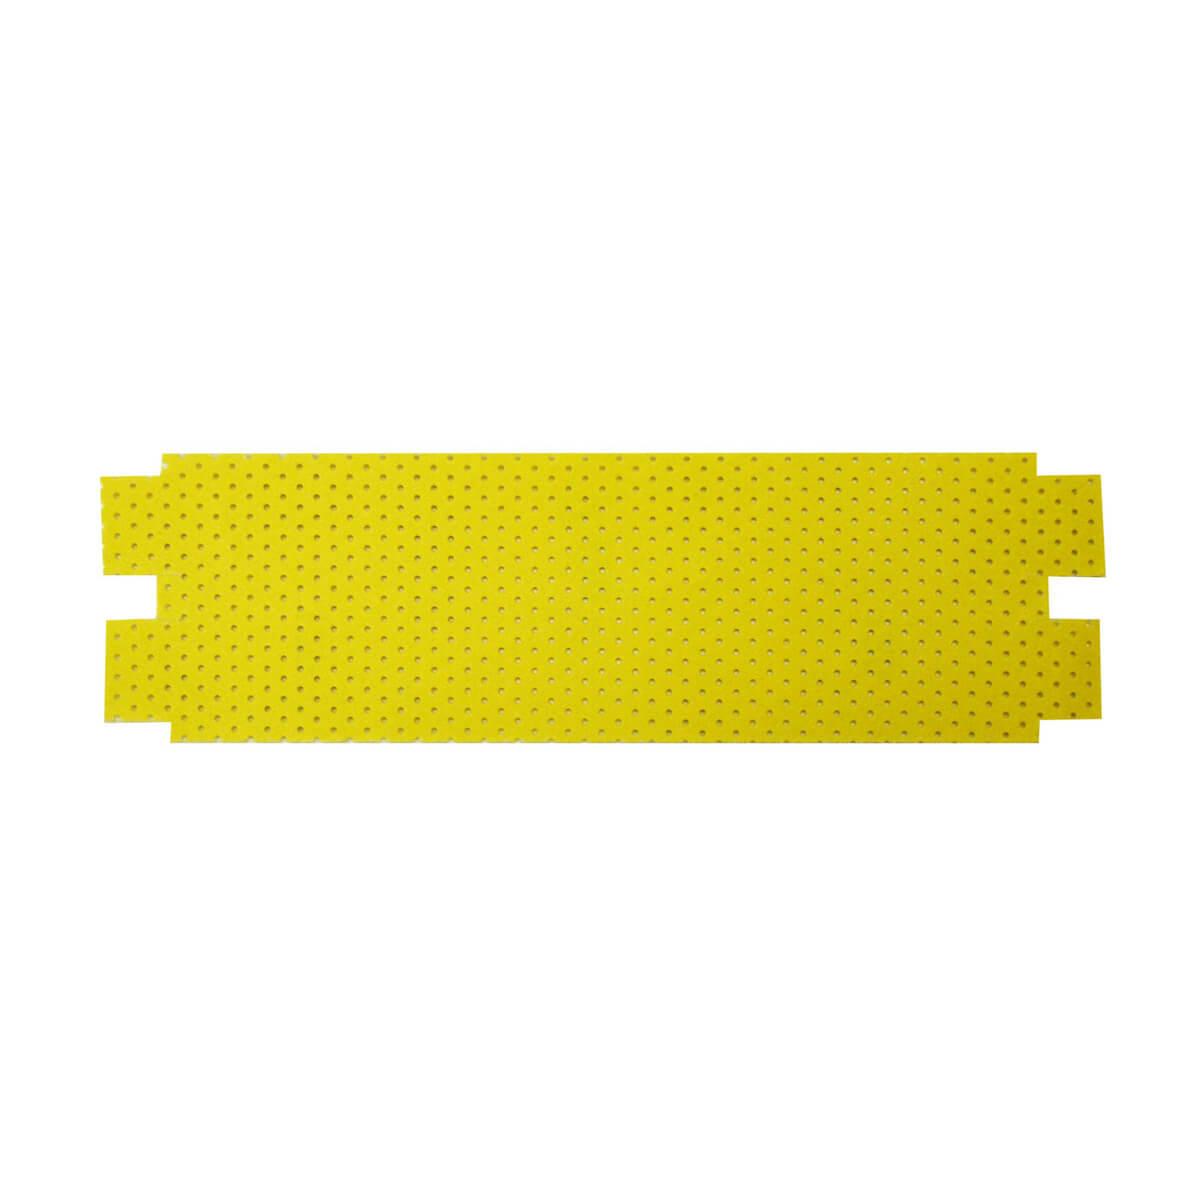 Perforated Drywall Sandpaper, Grit 120 - 2 Pack